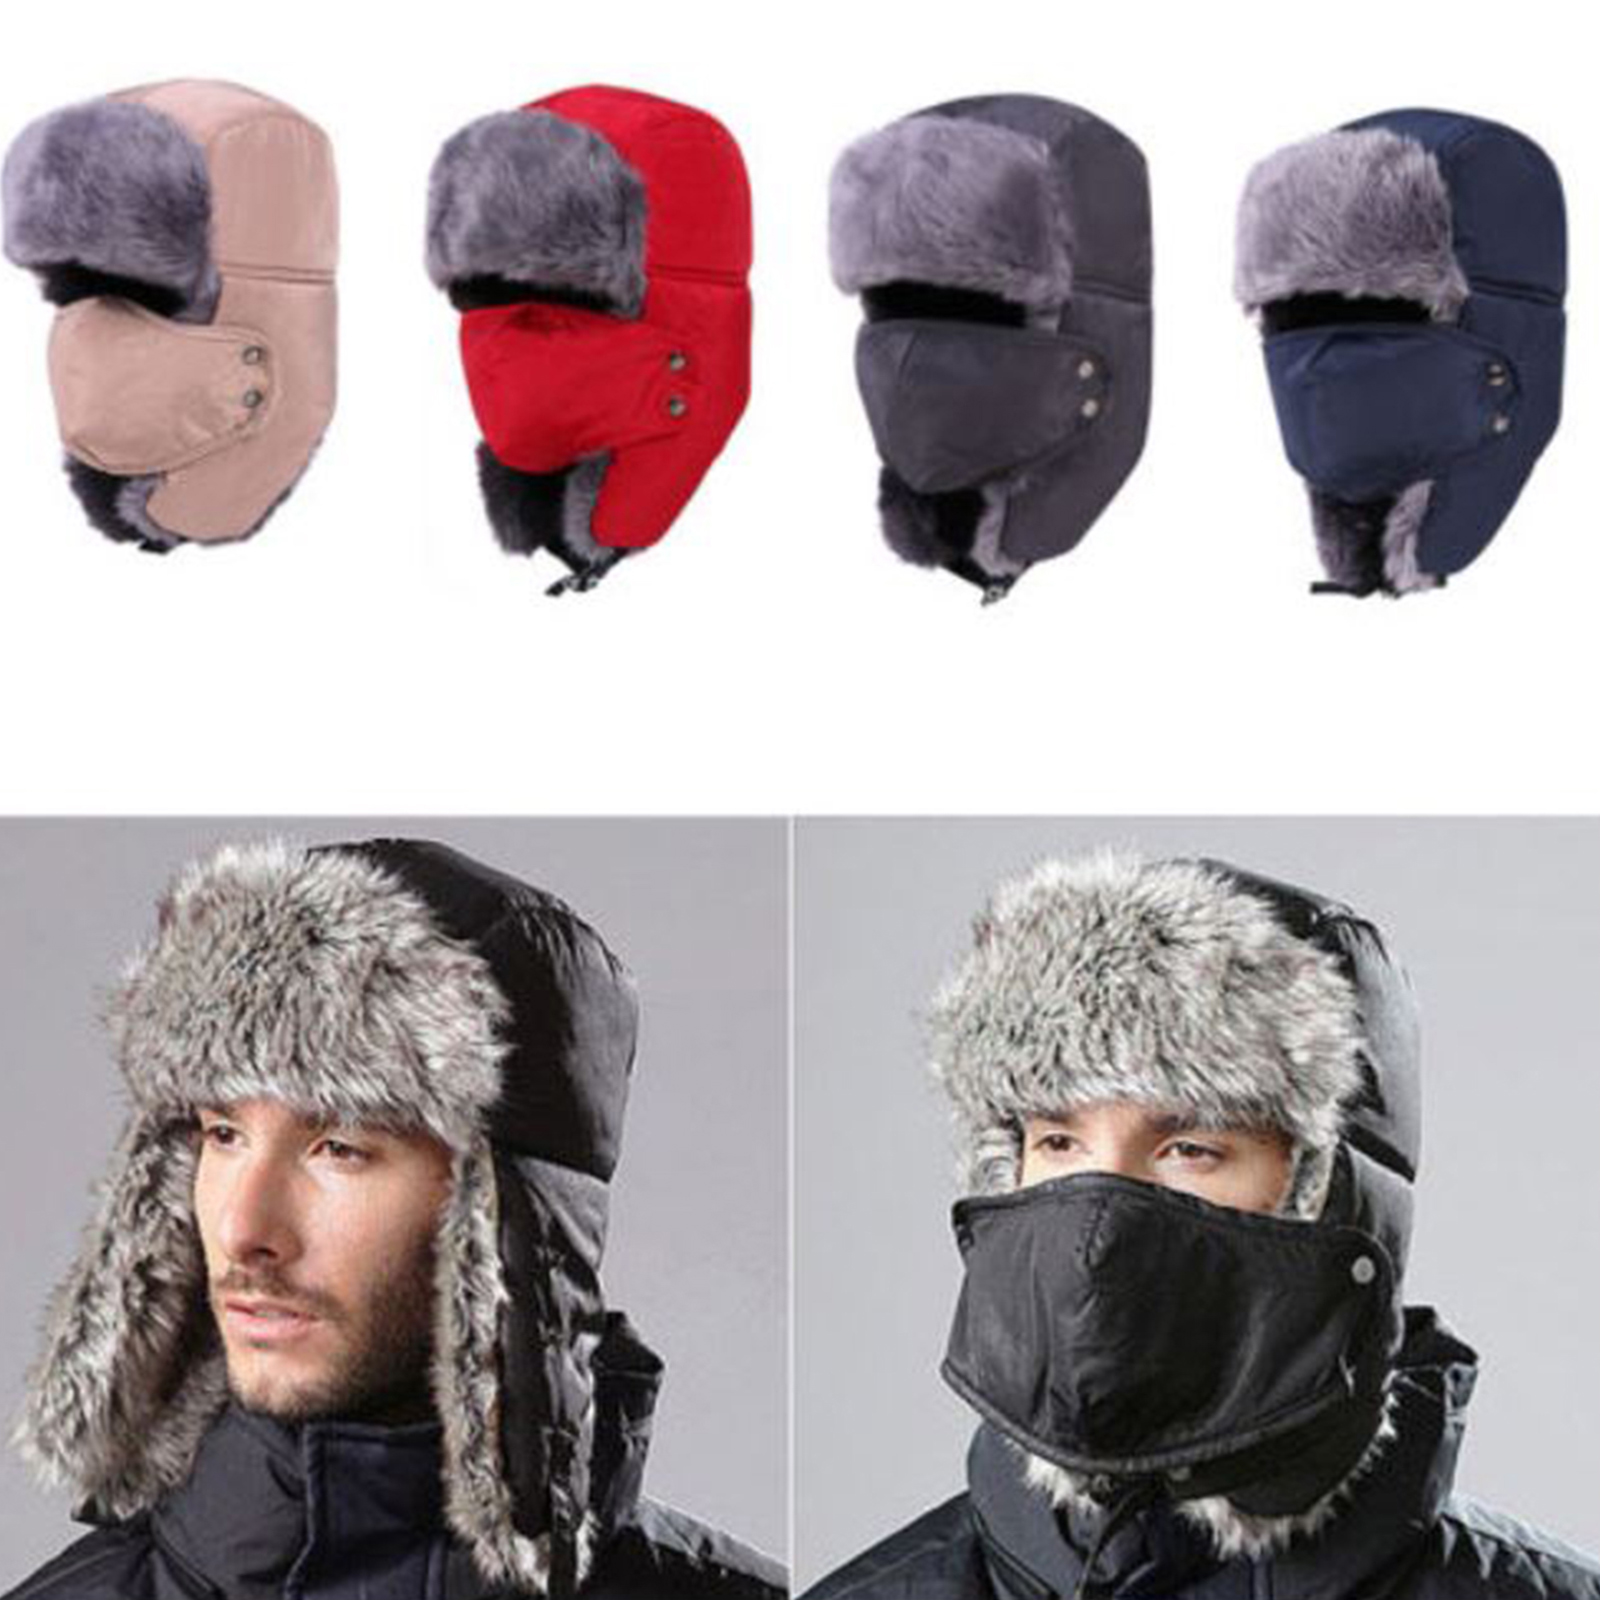 087dddbf1ad Details about Mens Winter Fur Ushanka Trapper Hat Aviator Earflap Ski Hat  Cap Hunting Trooper